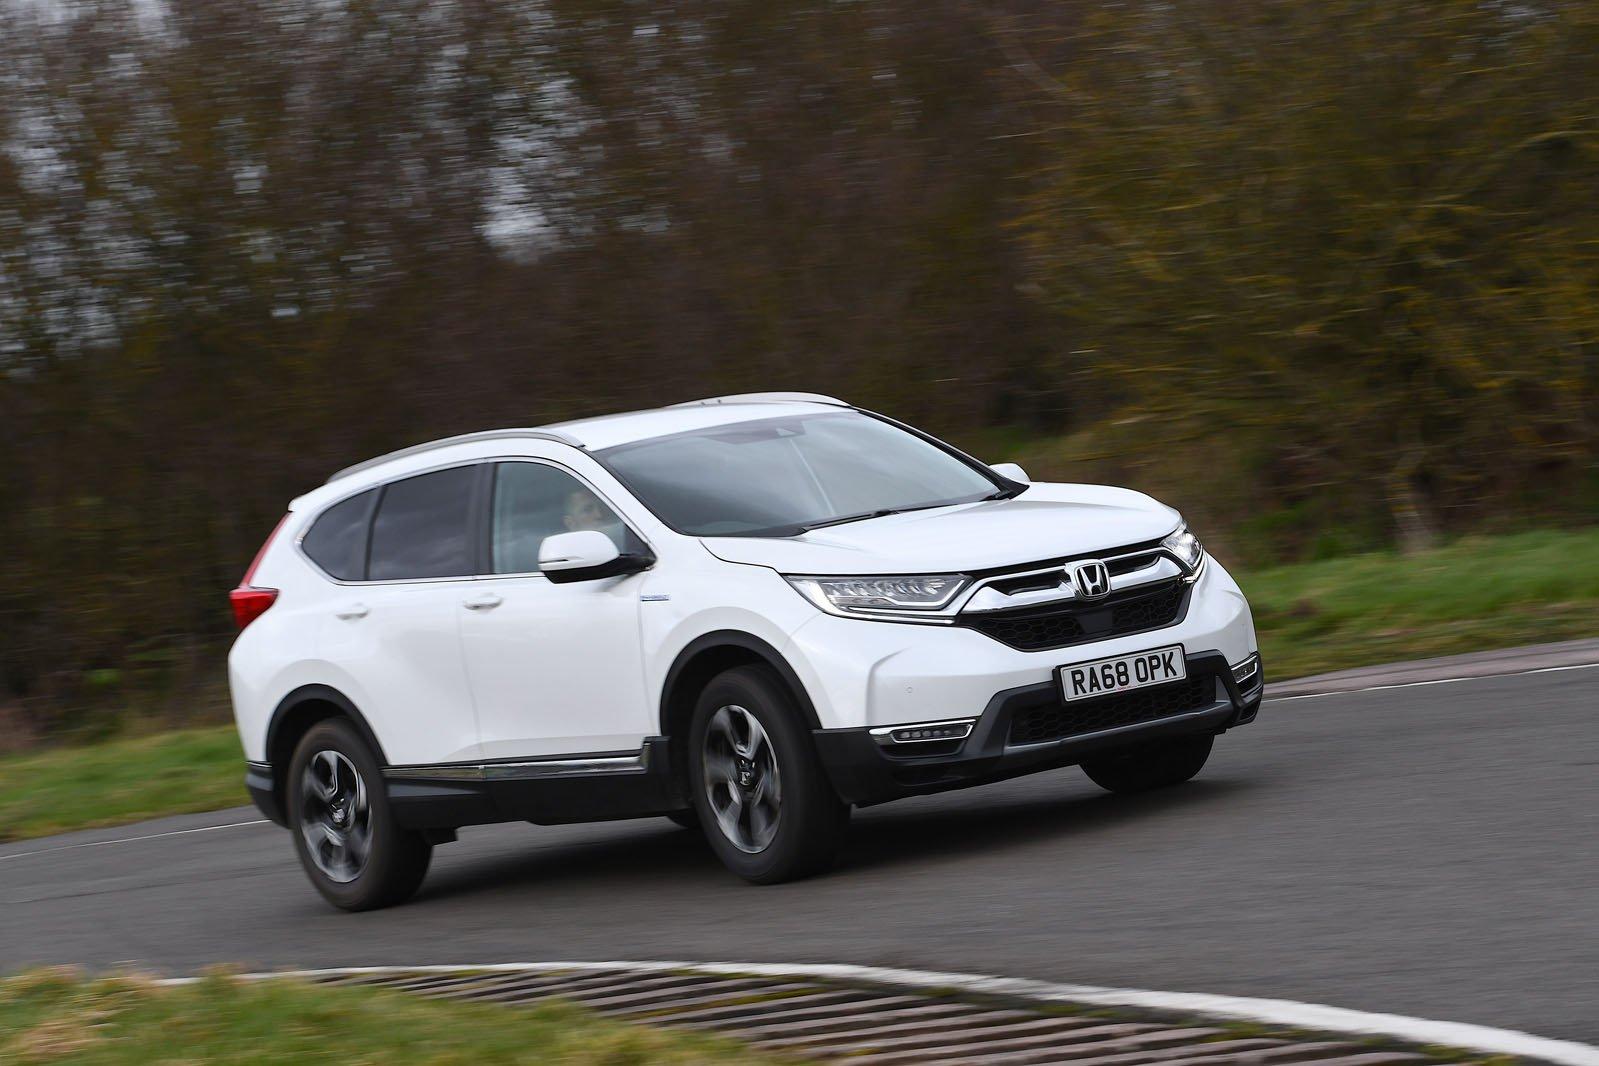 Honda CR-V 2019 front right tracking